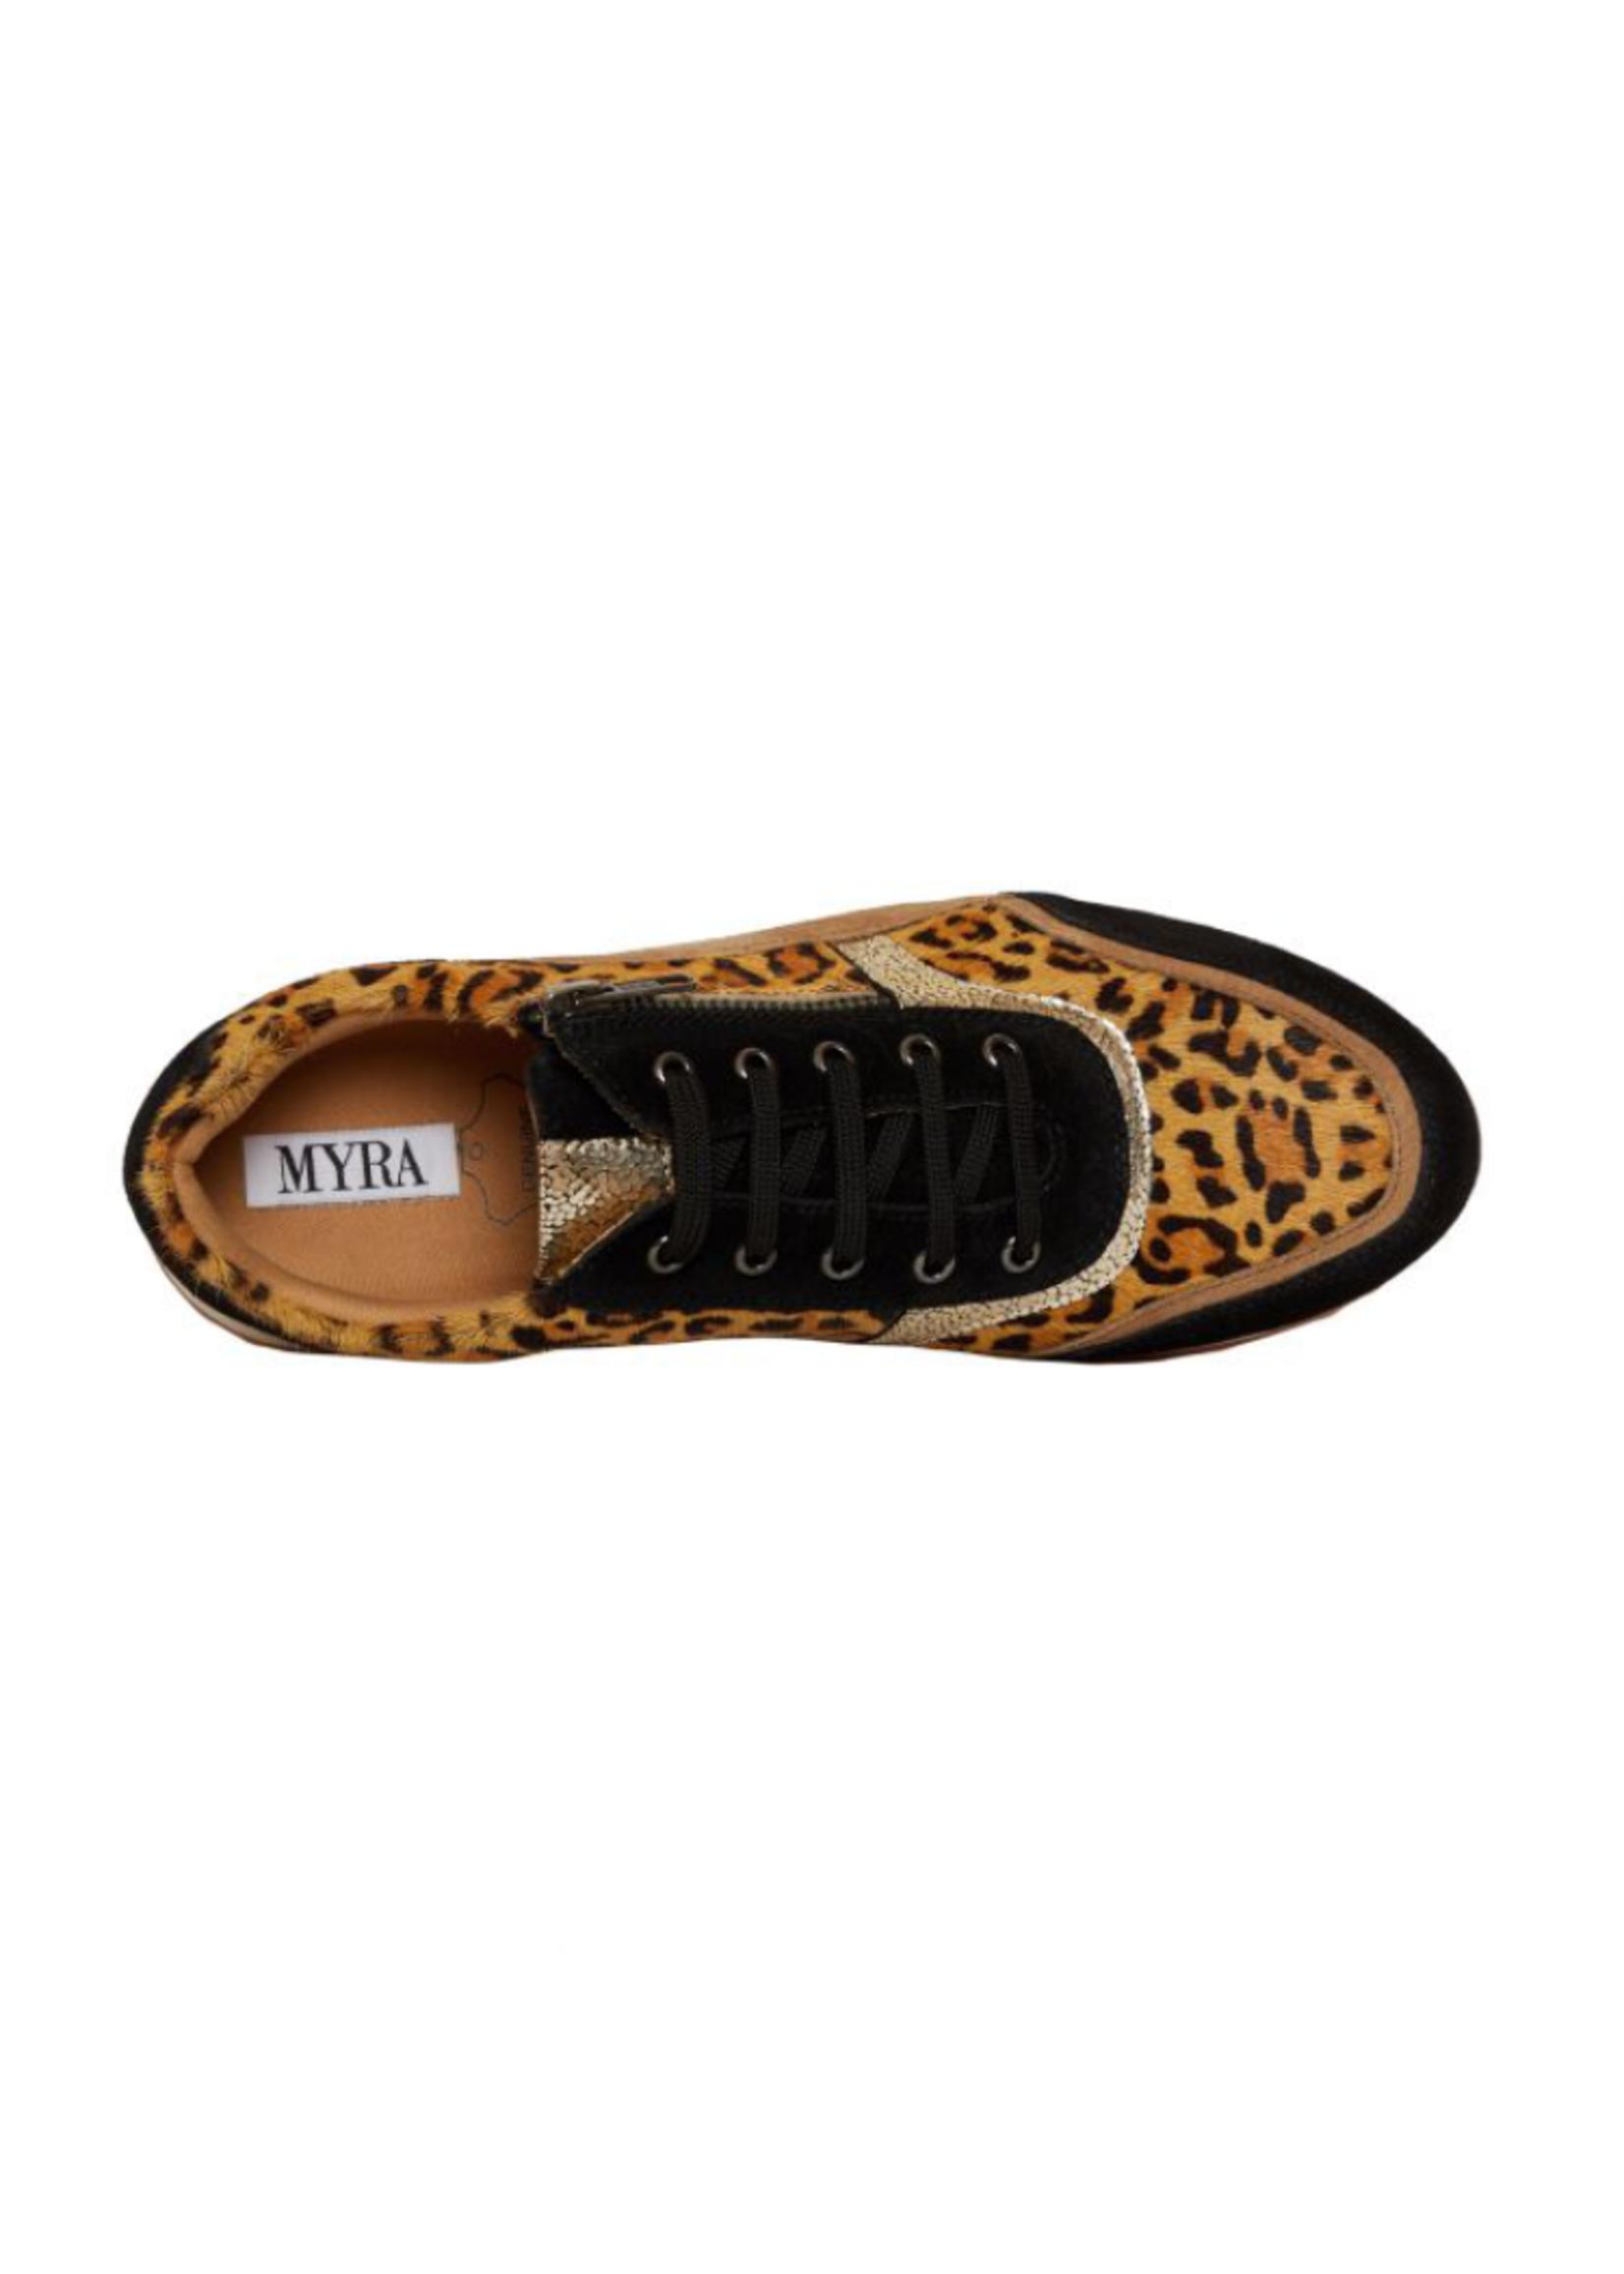 Myra Velocity Sneakers